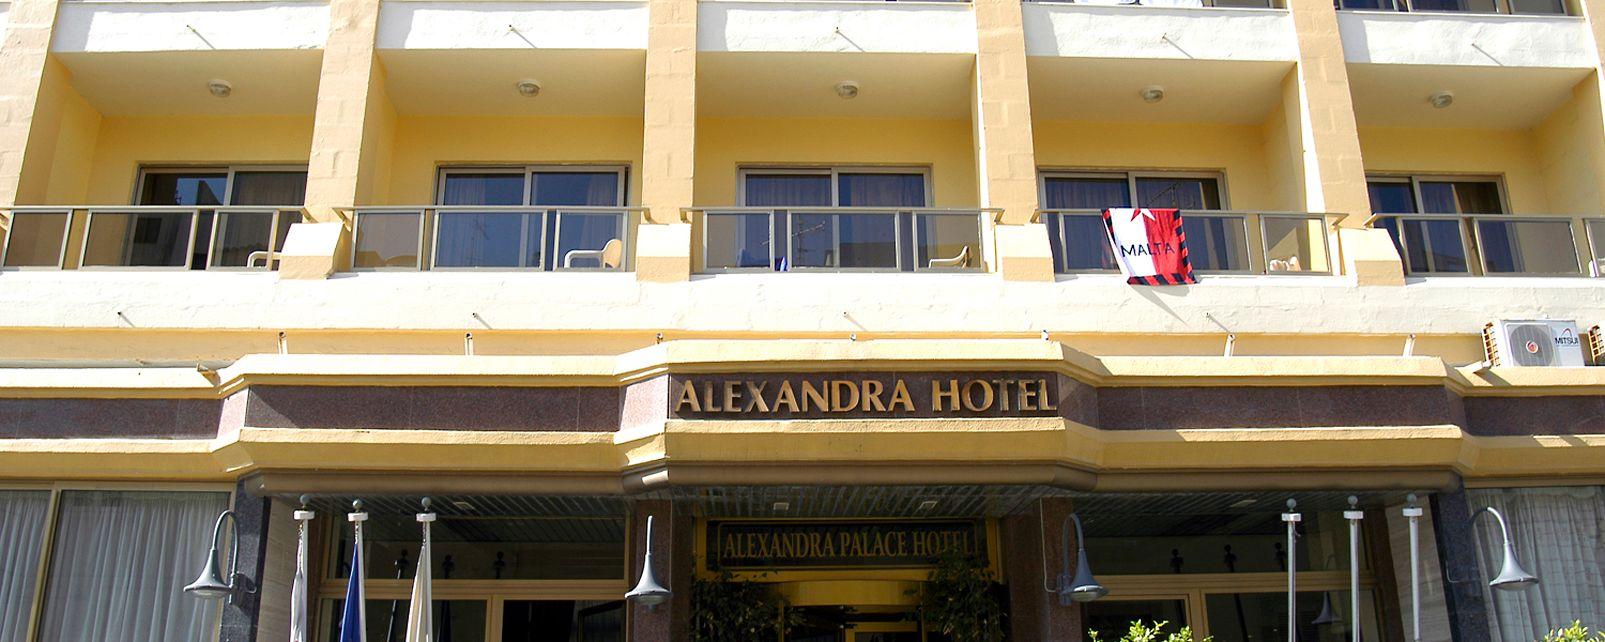 Hotel Alexandra Palace